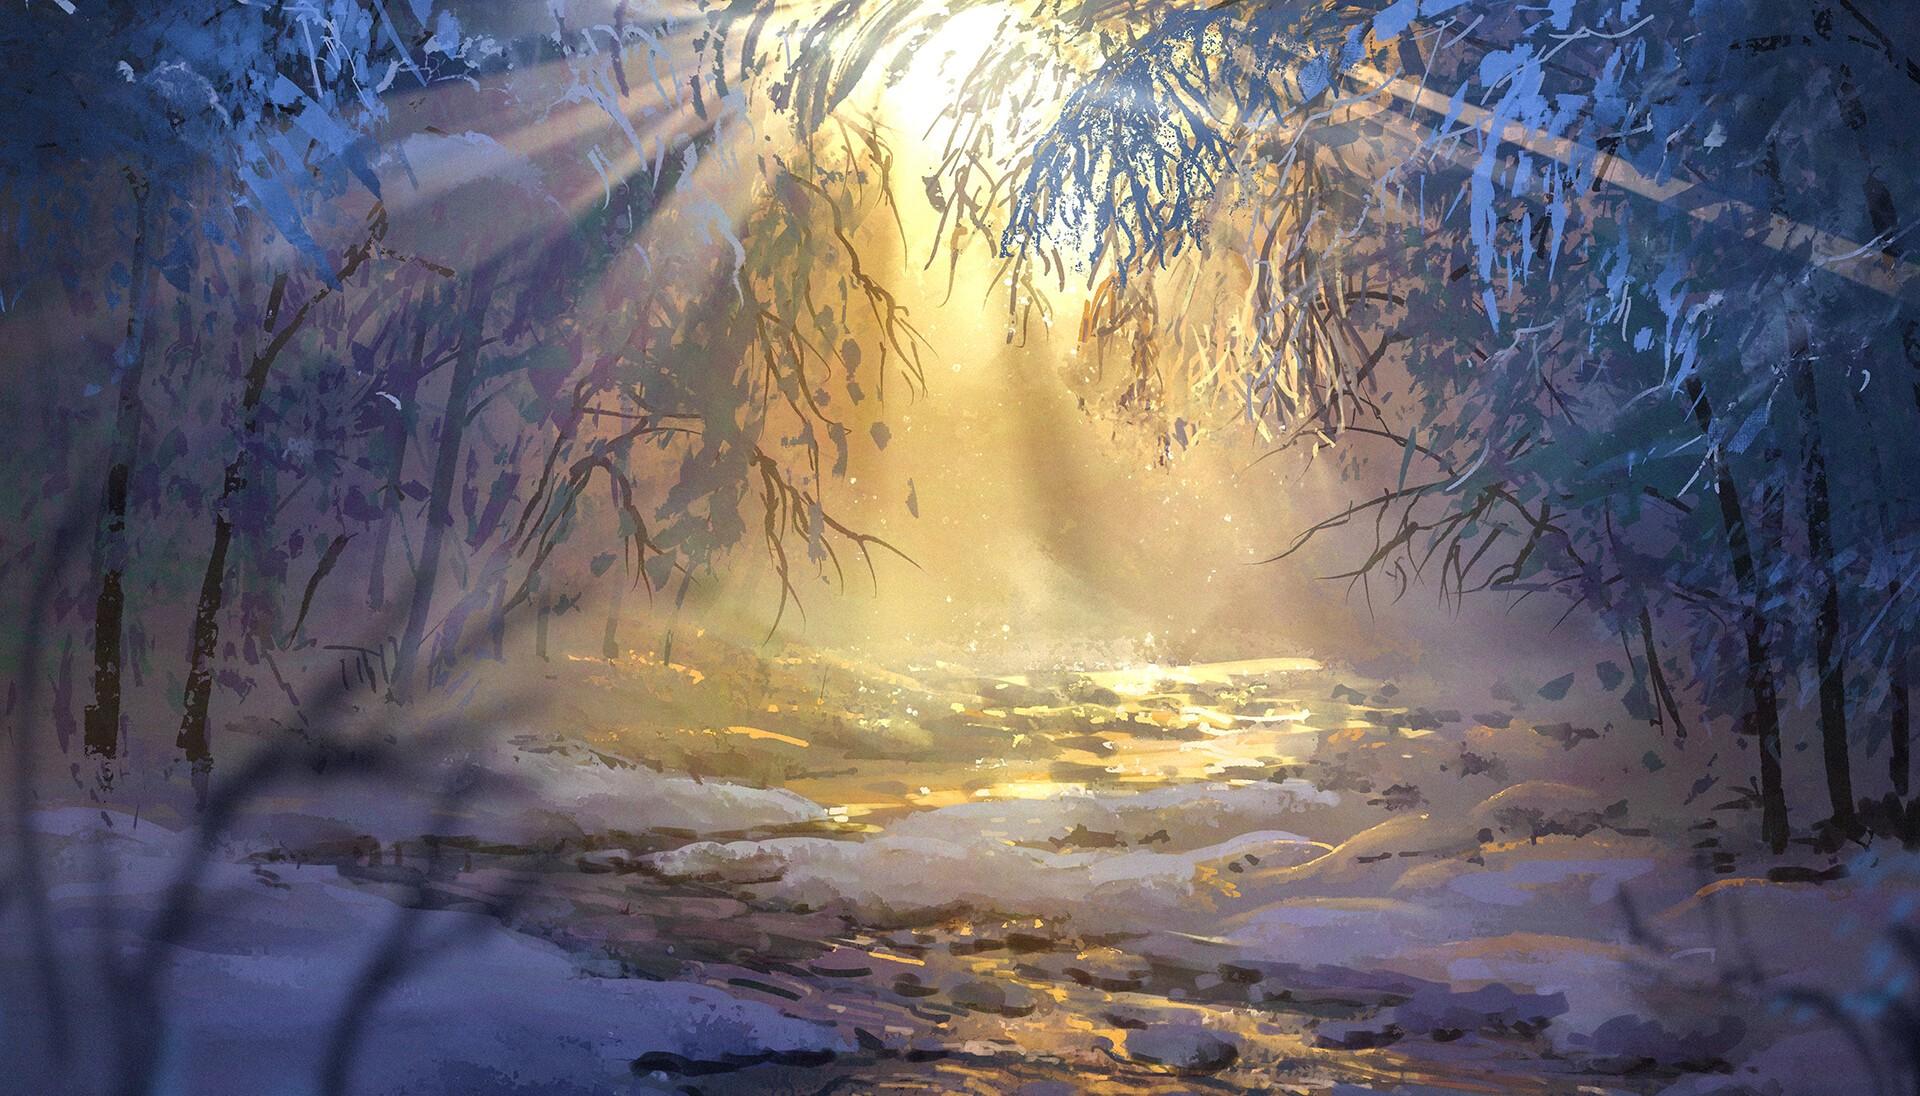 Anime 1920x1096 anime winter forest snow sunrise Surendra Rajawat